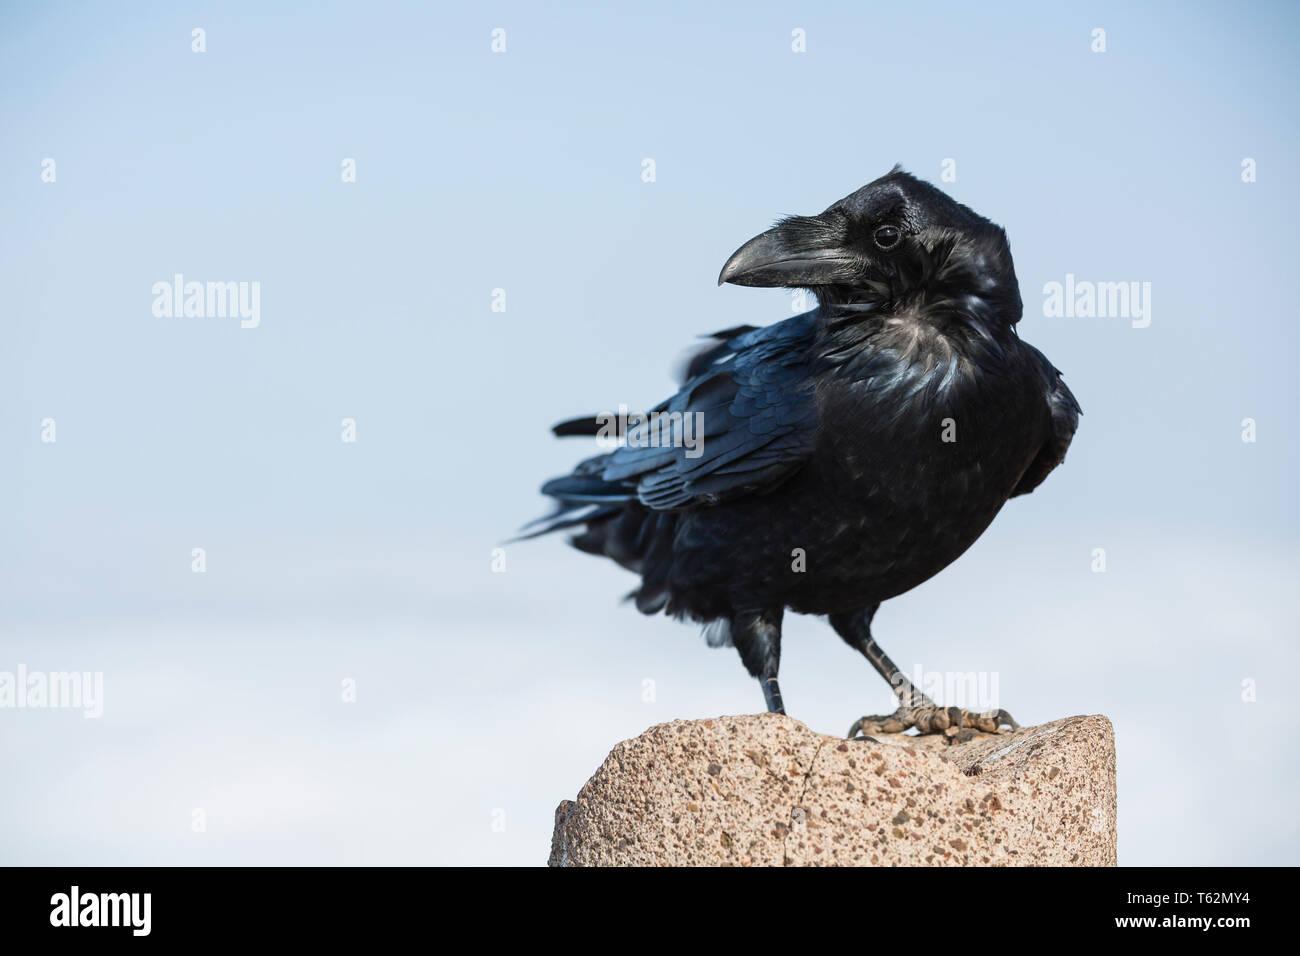 Eine schwarze Krähe auf dem Gipfel des Pico Birigoyo Spalte in La Palma, Spanien. Stockbild